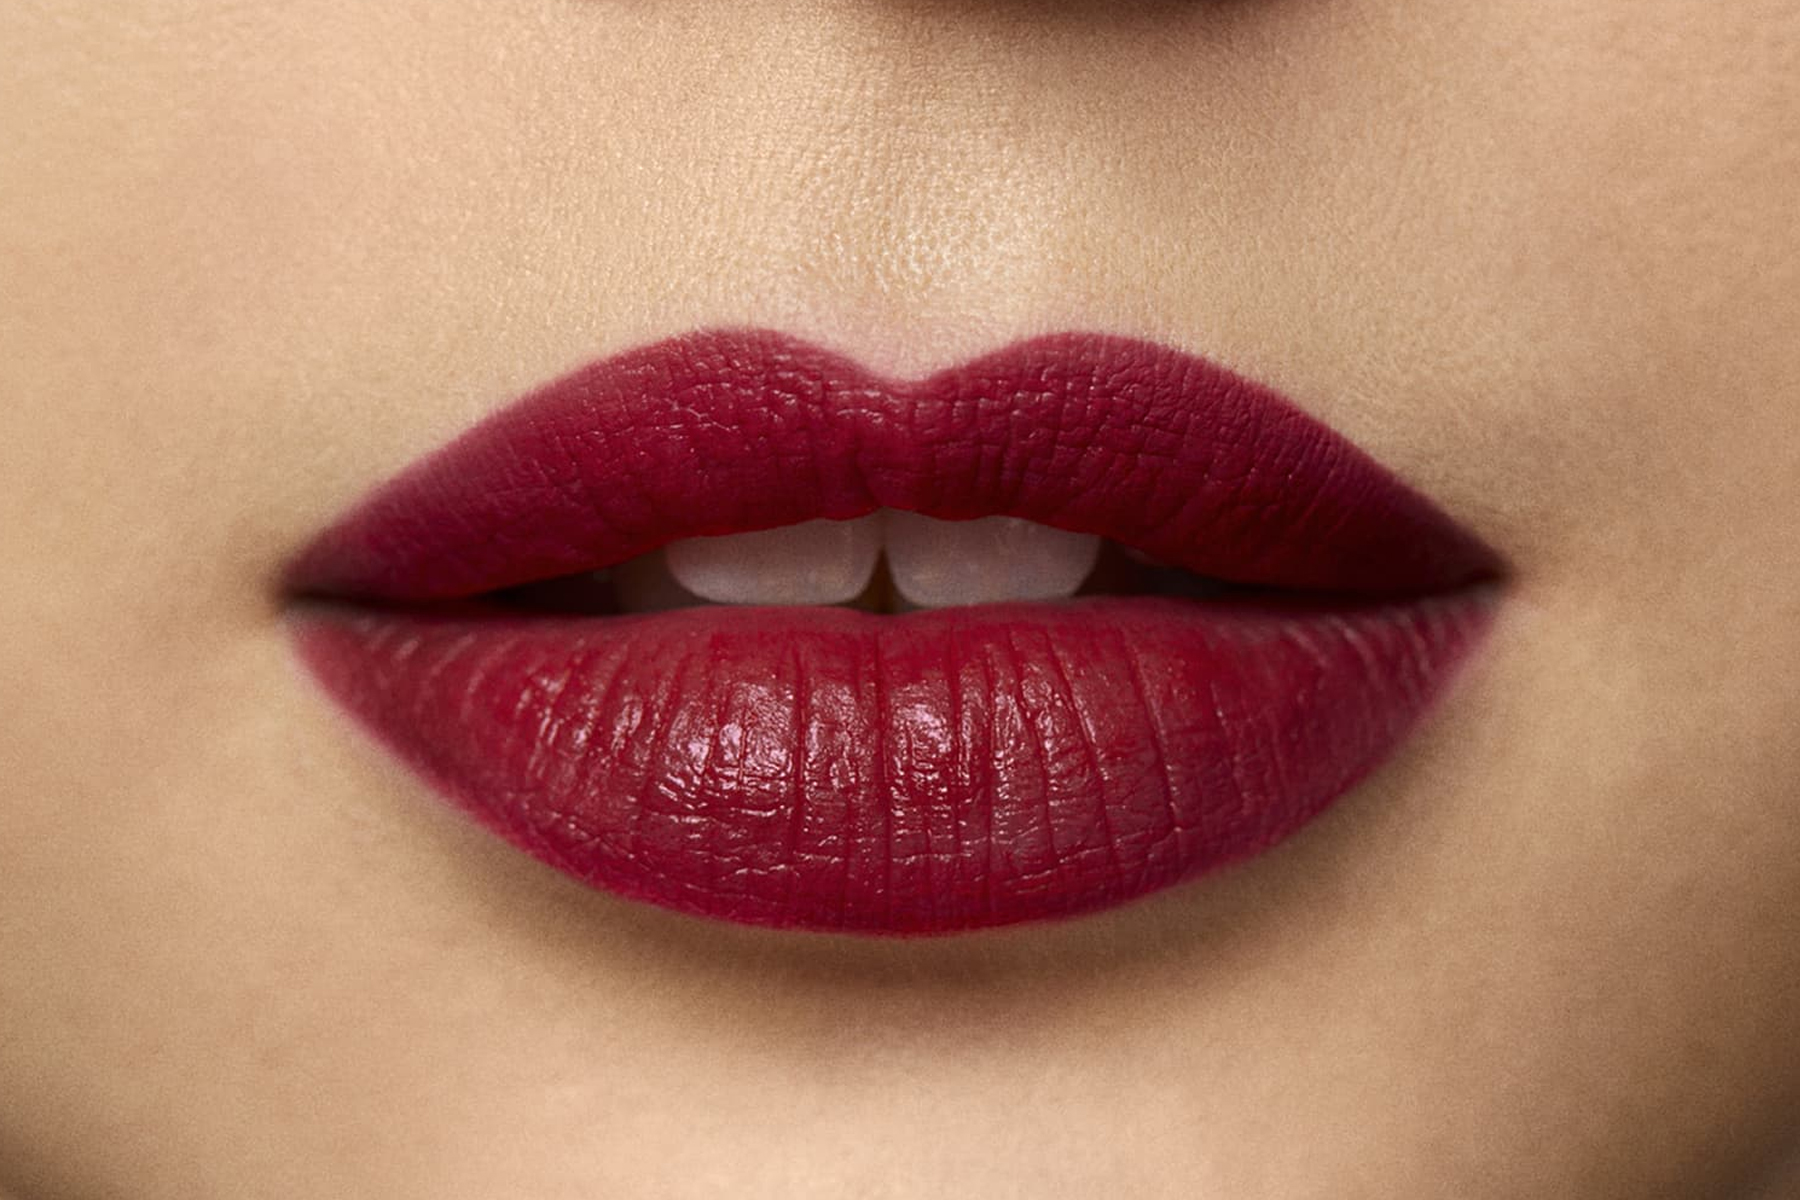 laura-mercier-rouge-essentiel-rouge-profond-swatch